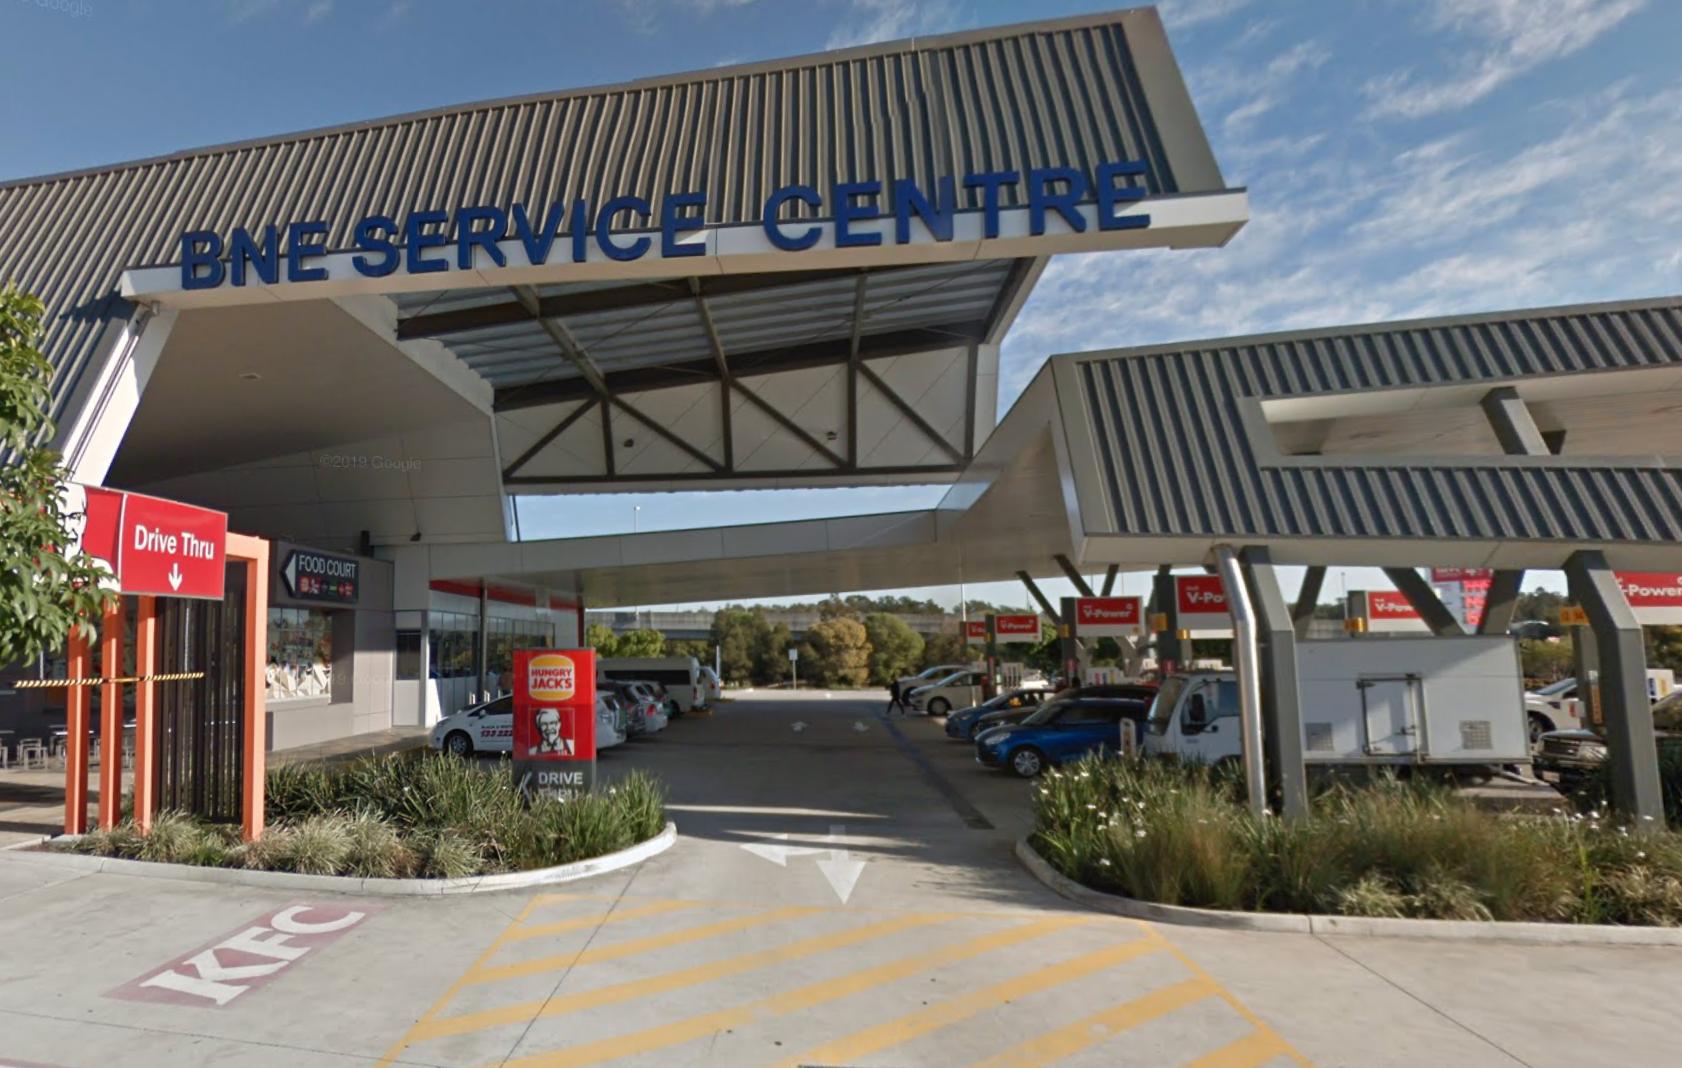 Brisbane Airport Link Service Centre. (Photo: Google Maps)